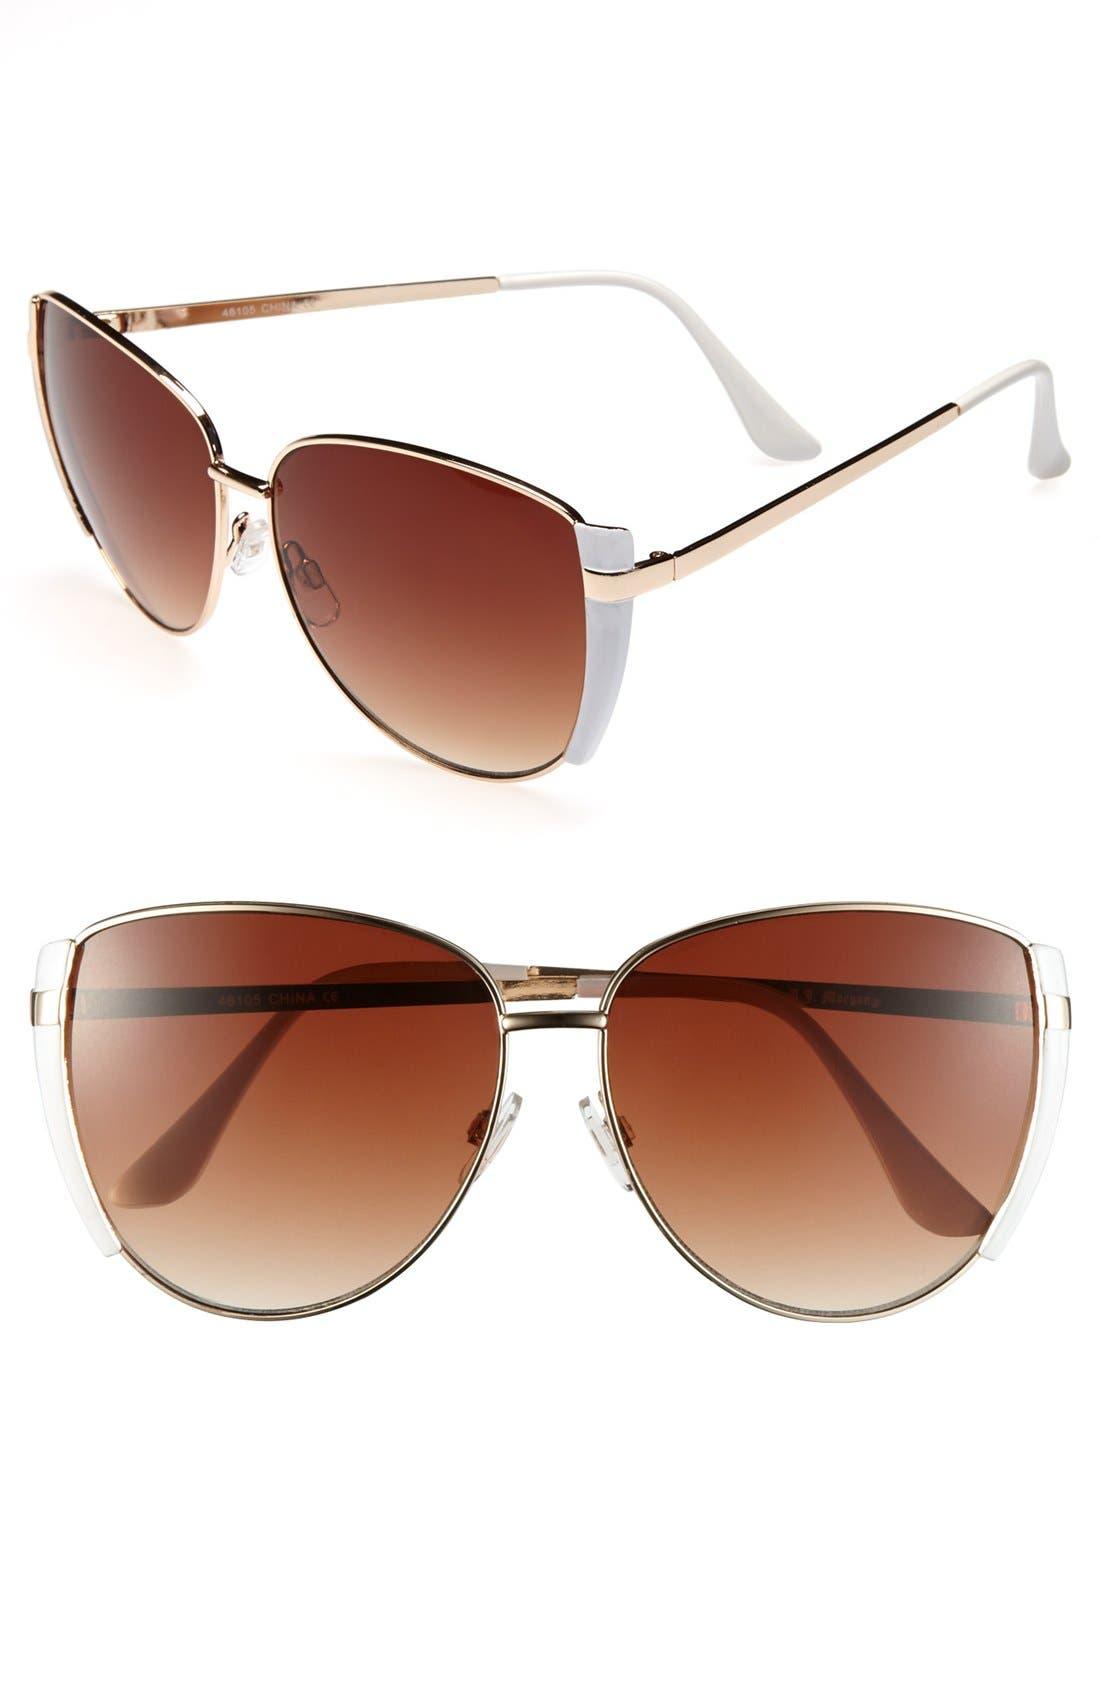 Main Image - A.J. Morgan 'Cabo' Sunglasses